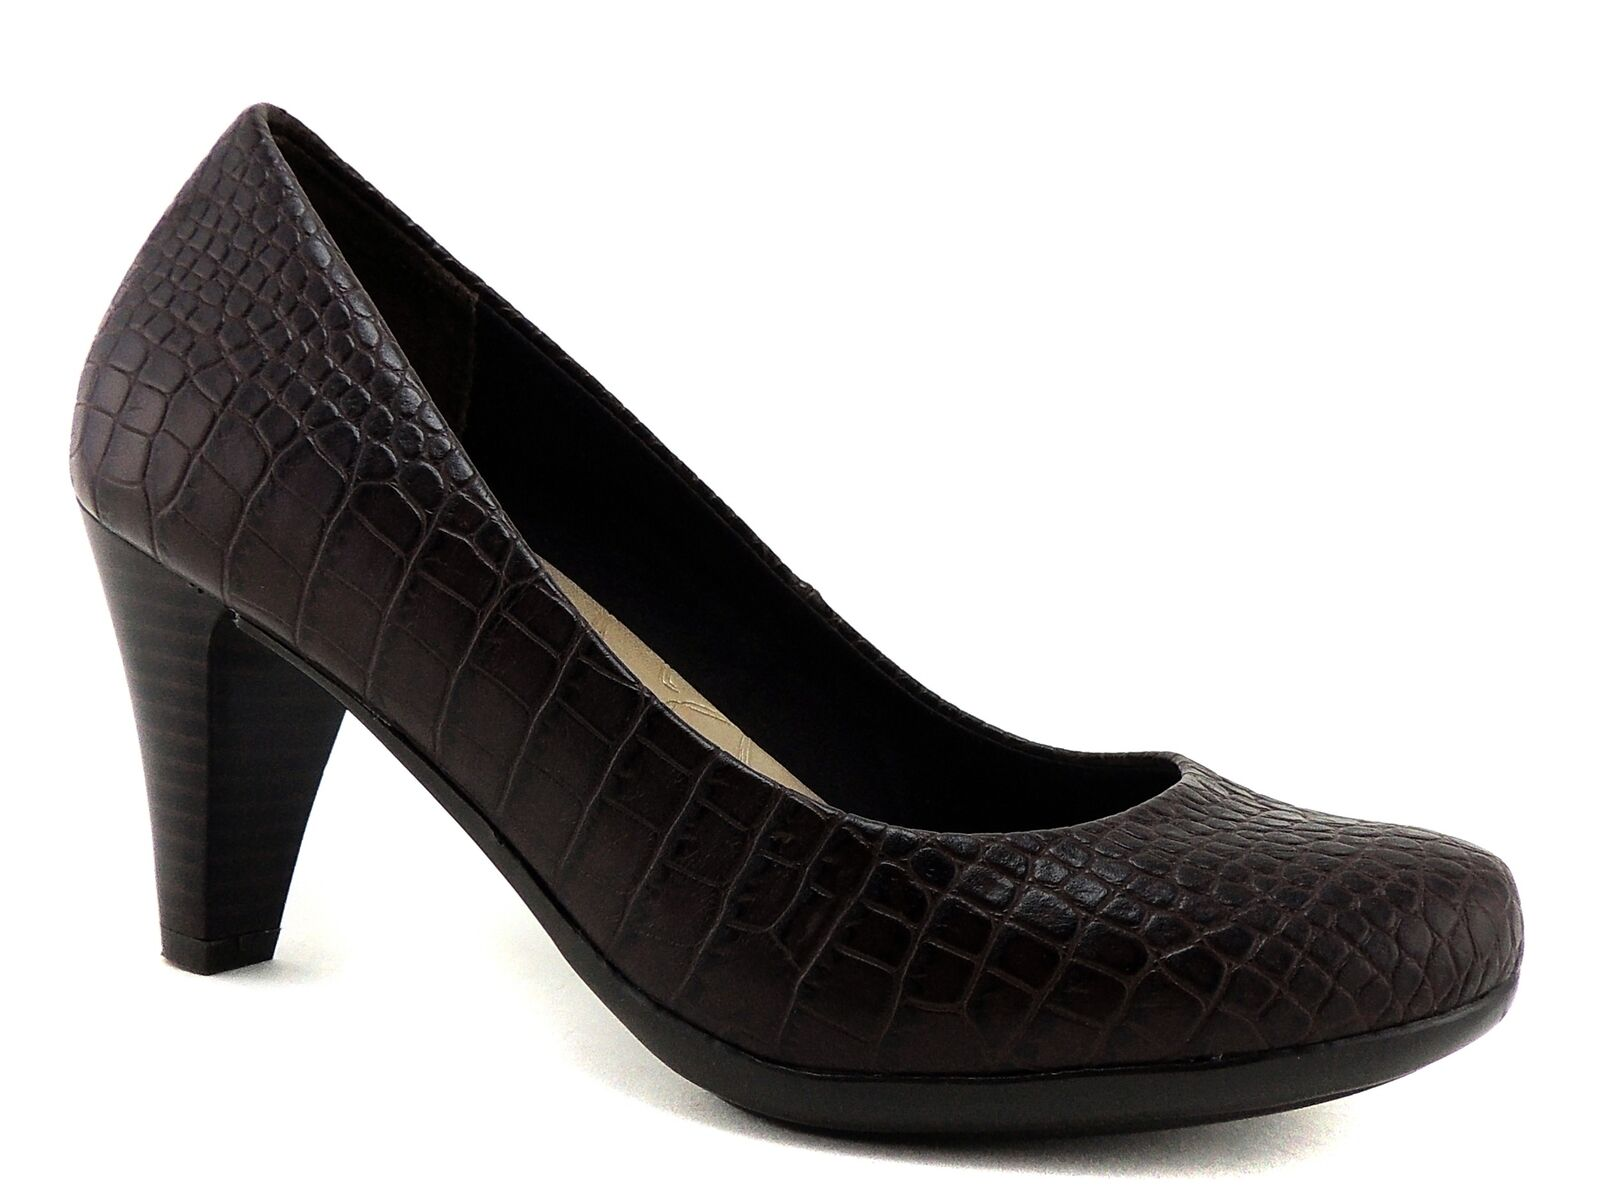 Giani Bernini Women's Sweets Pumps Brown Croco Print Shoes Size 5.5 (B, M)